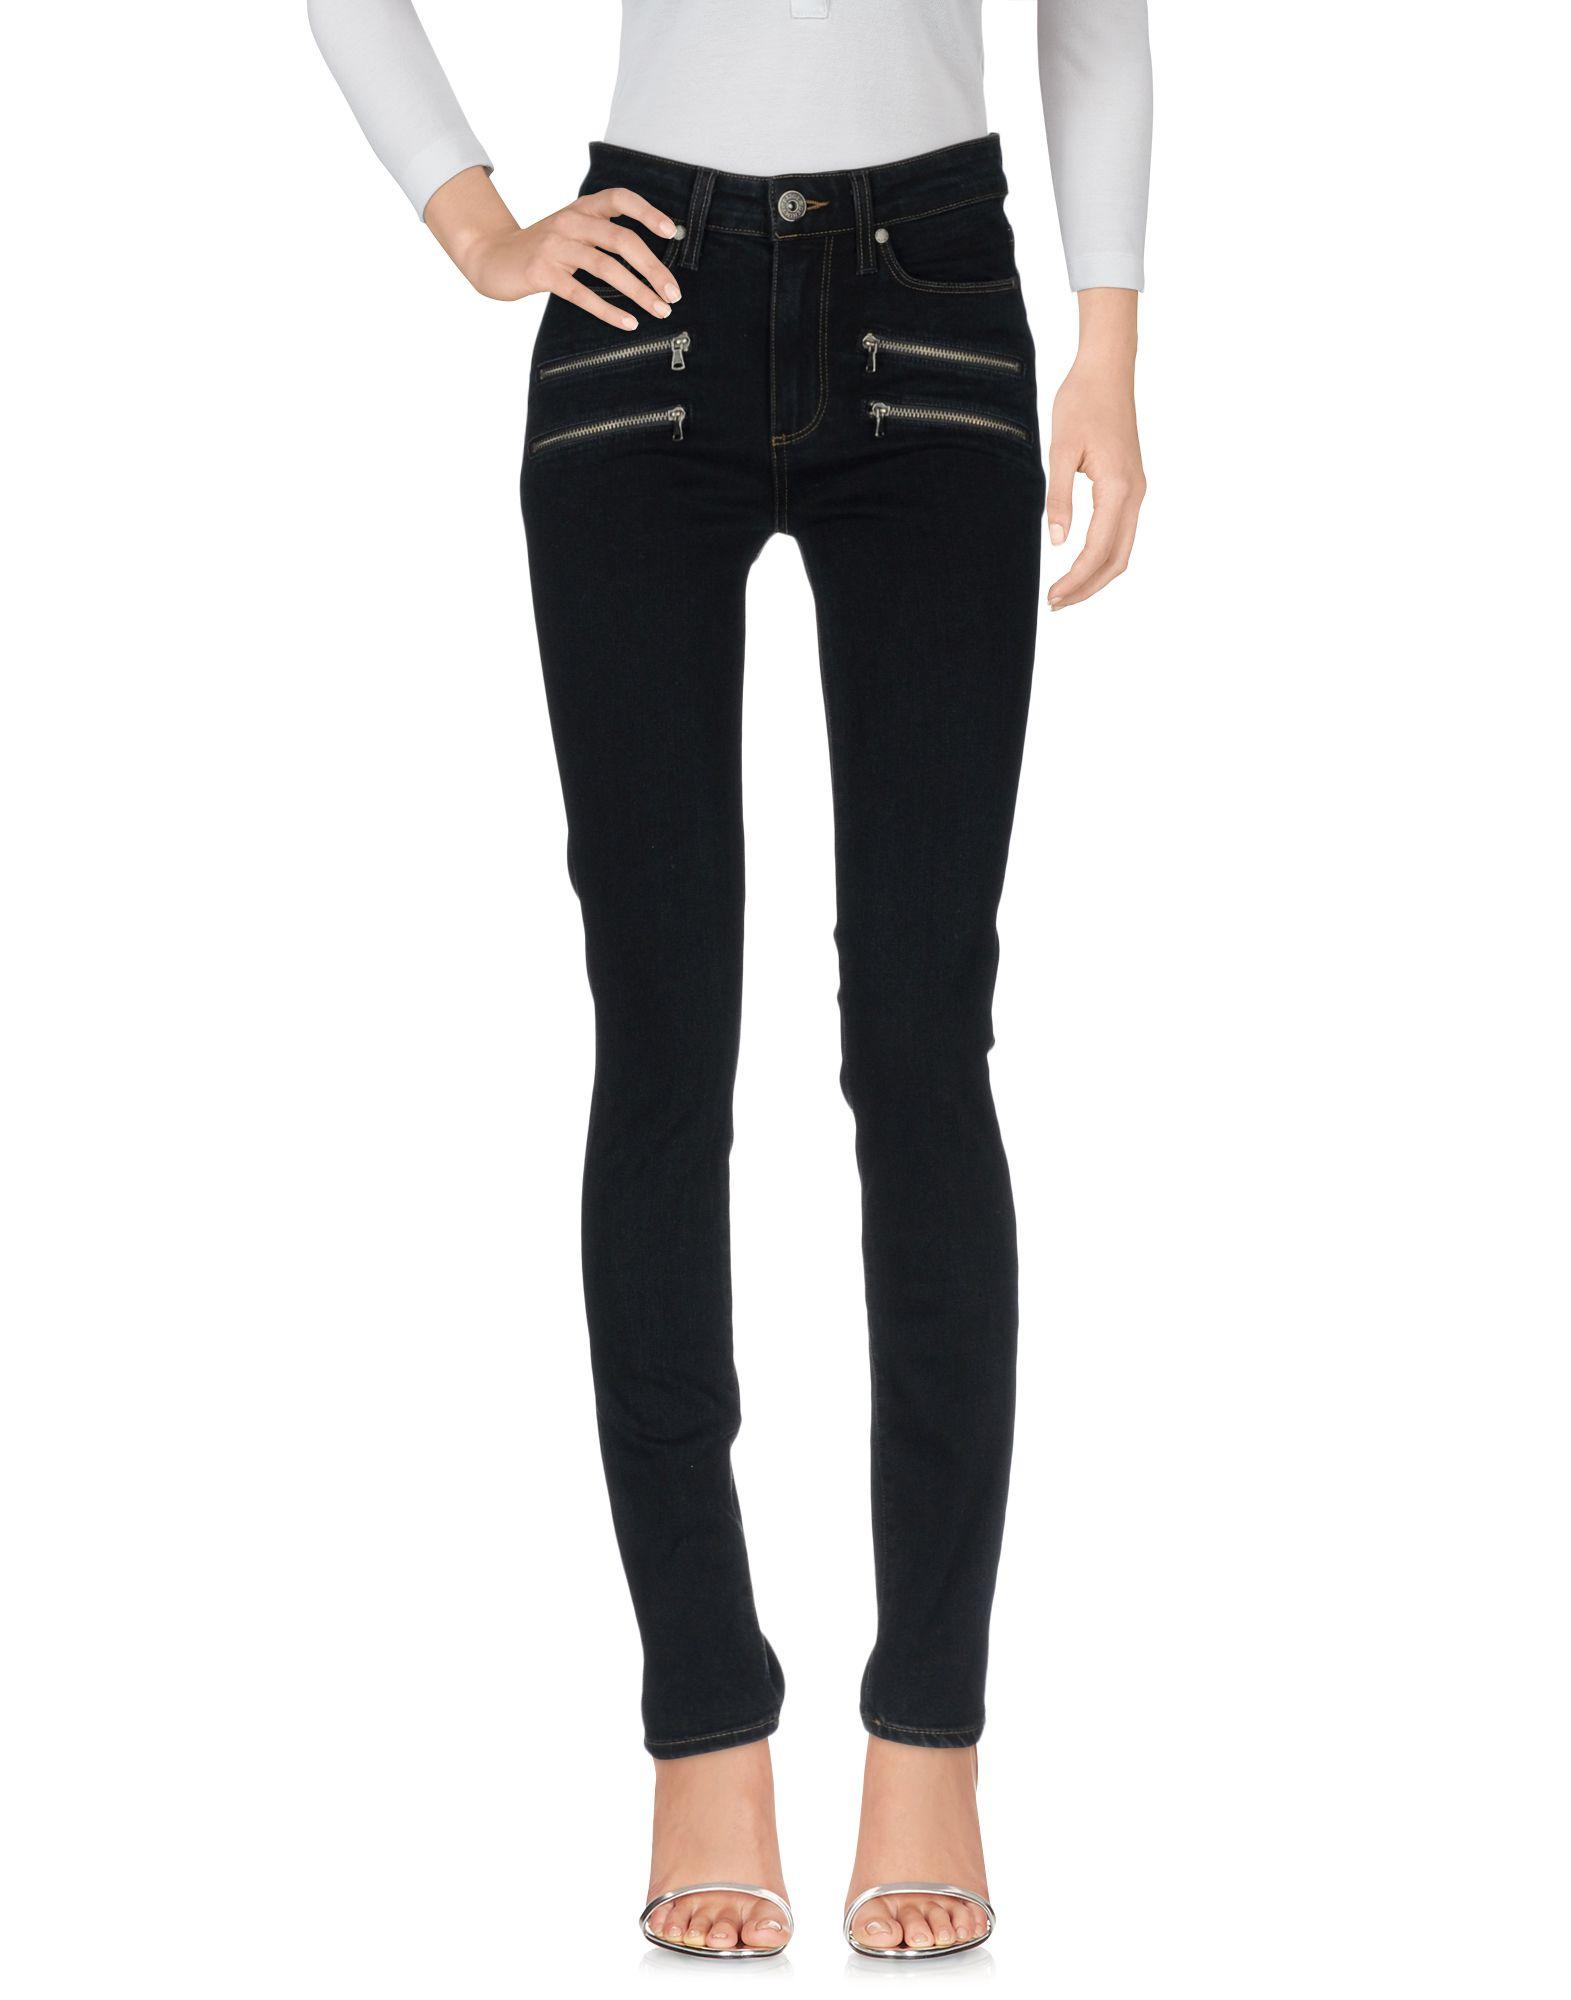 Pantaloni Jeans Paige Donna - Acquista online su MoA1GVh9s8